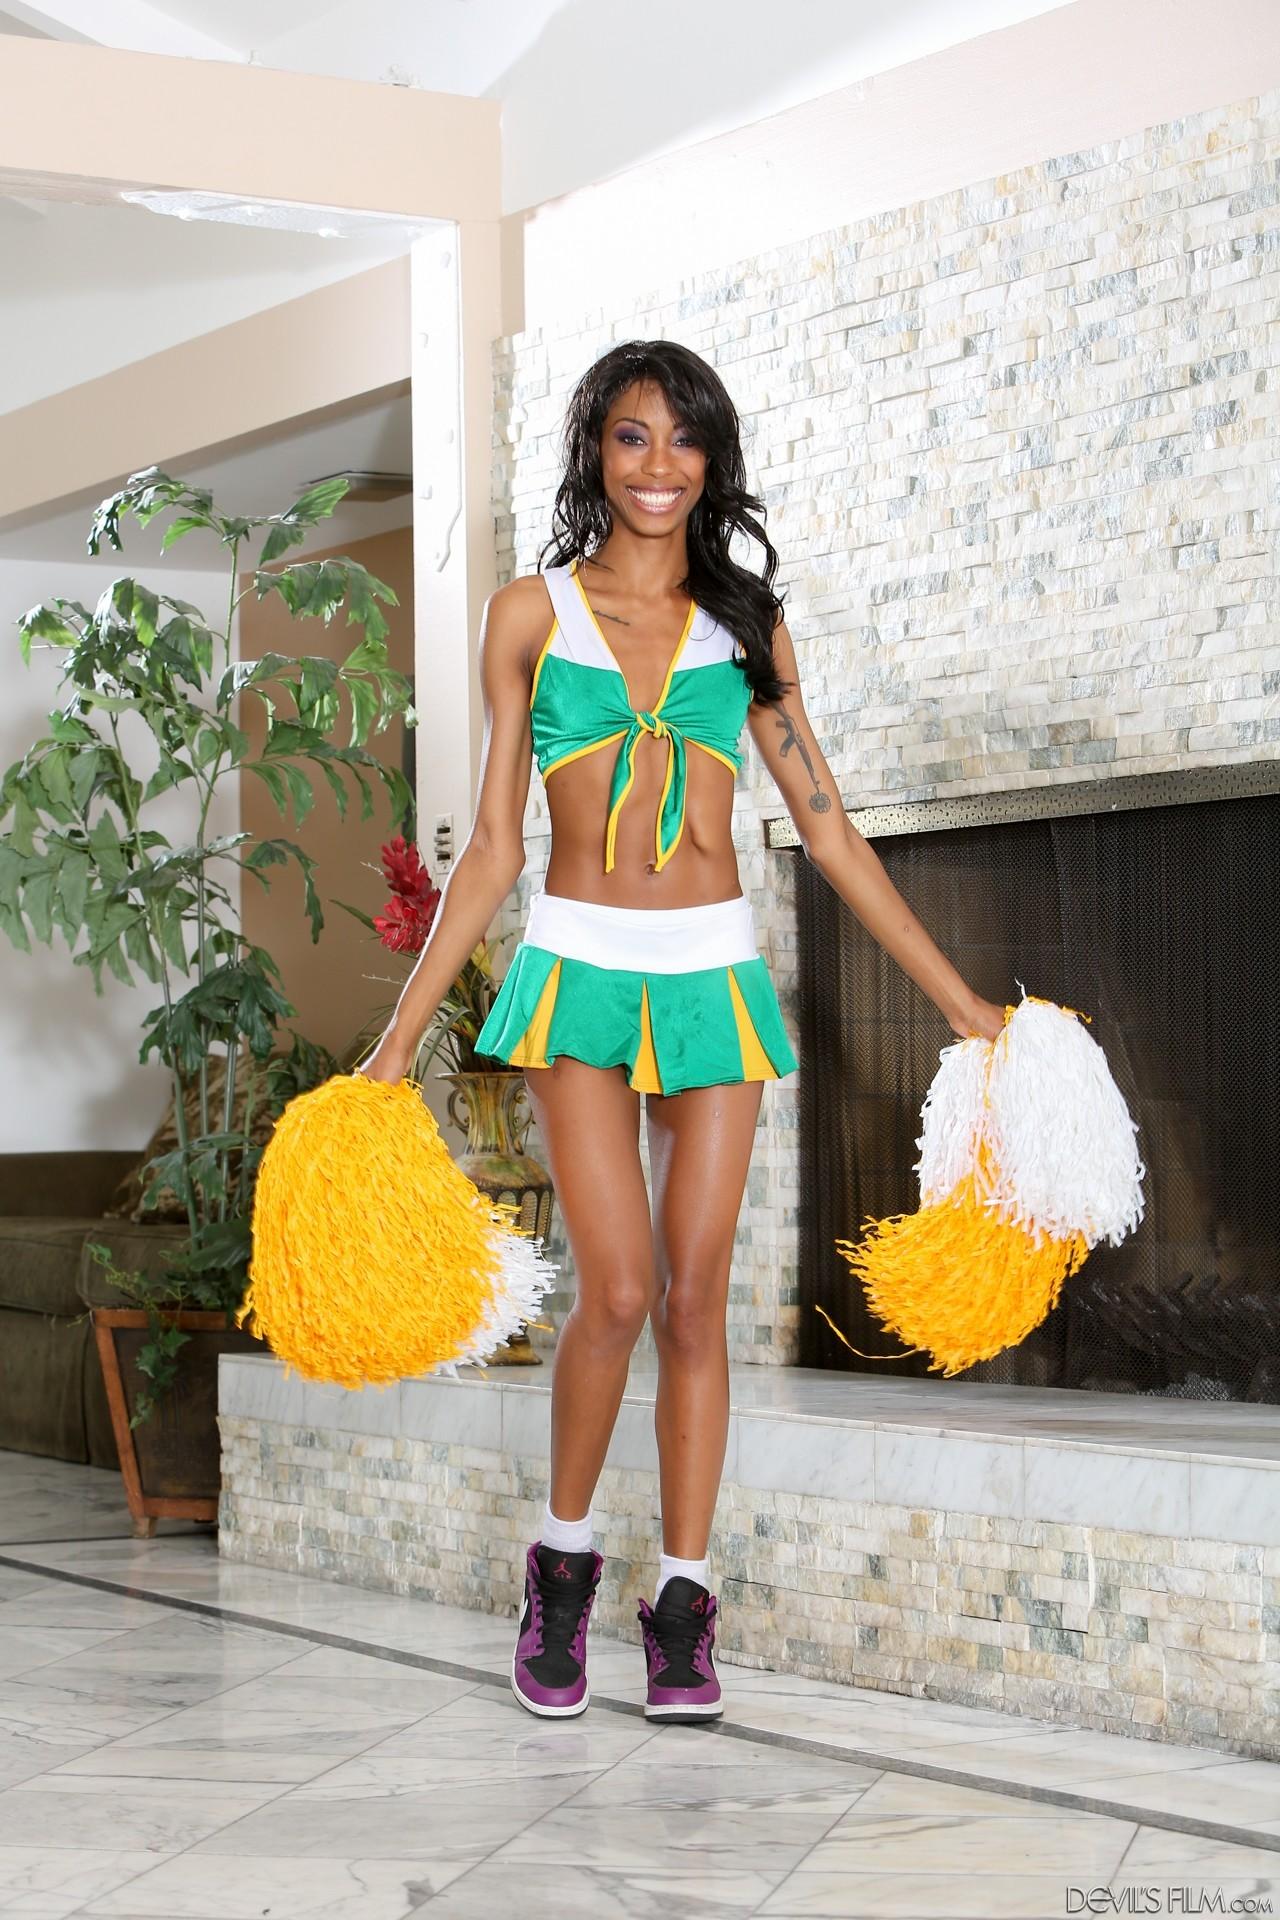 Adriana malao cheerleader